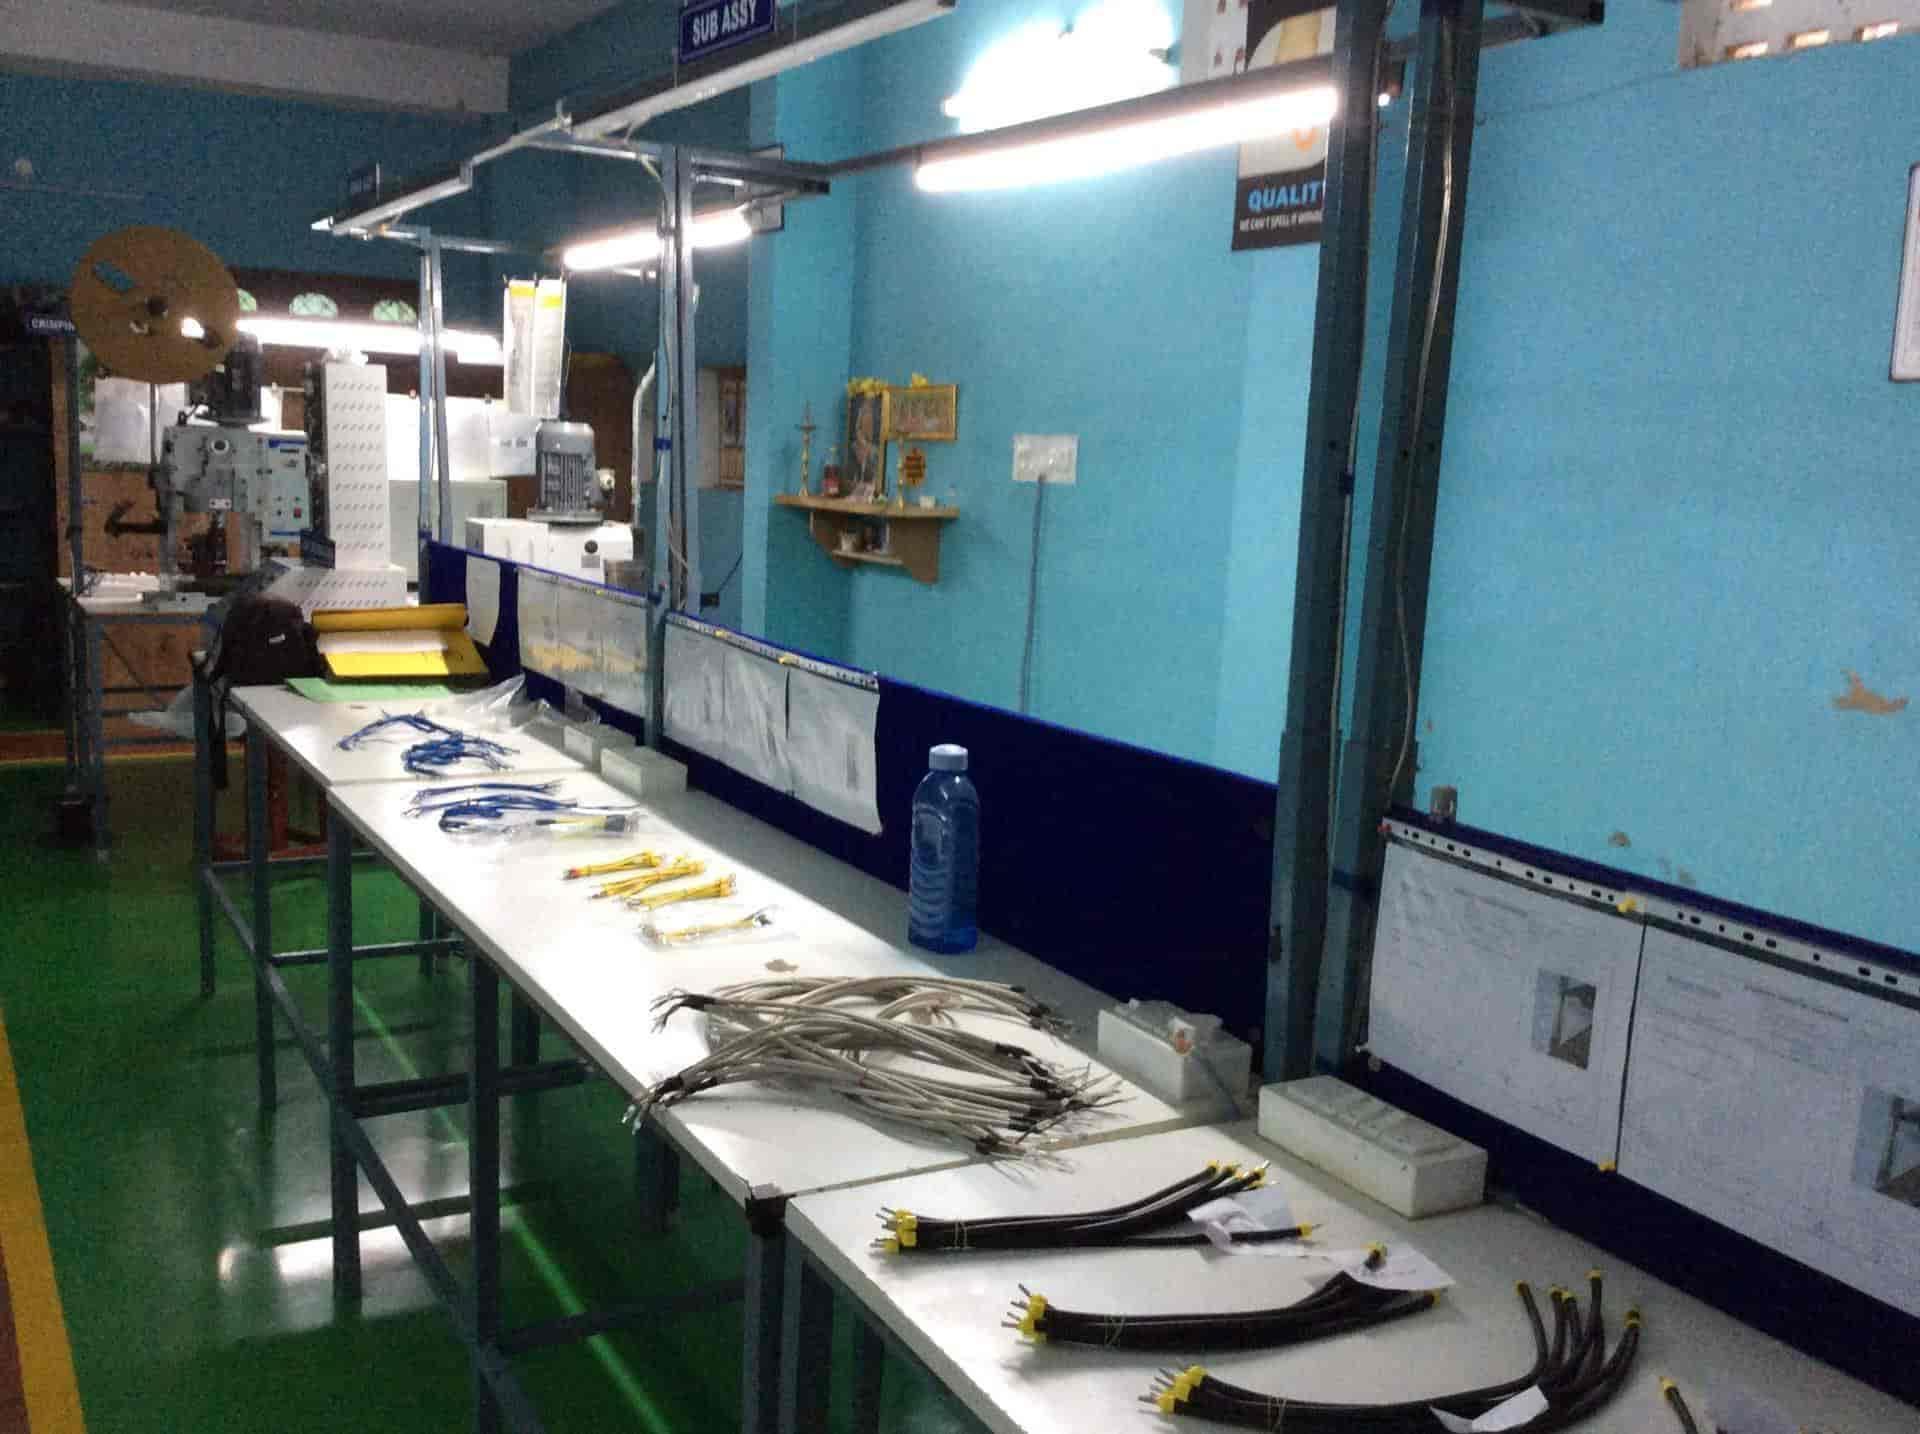 srisai wiring harness pvt ltd, nazarethpettai - electrical wiring harness  manufacturers-minda in chennai - justdial